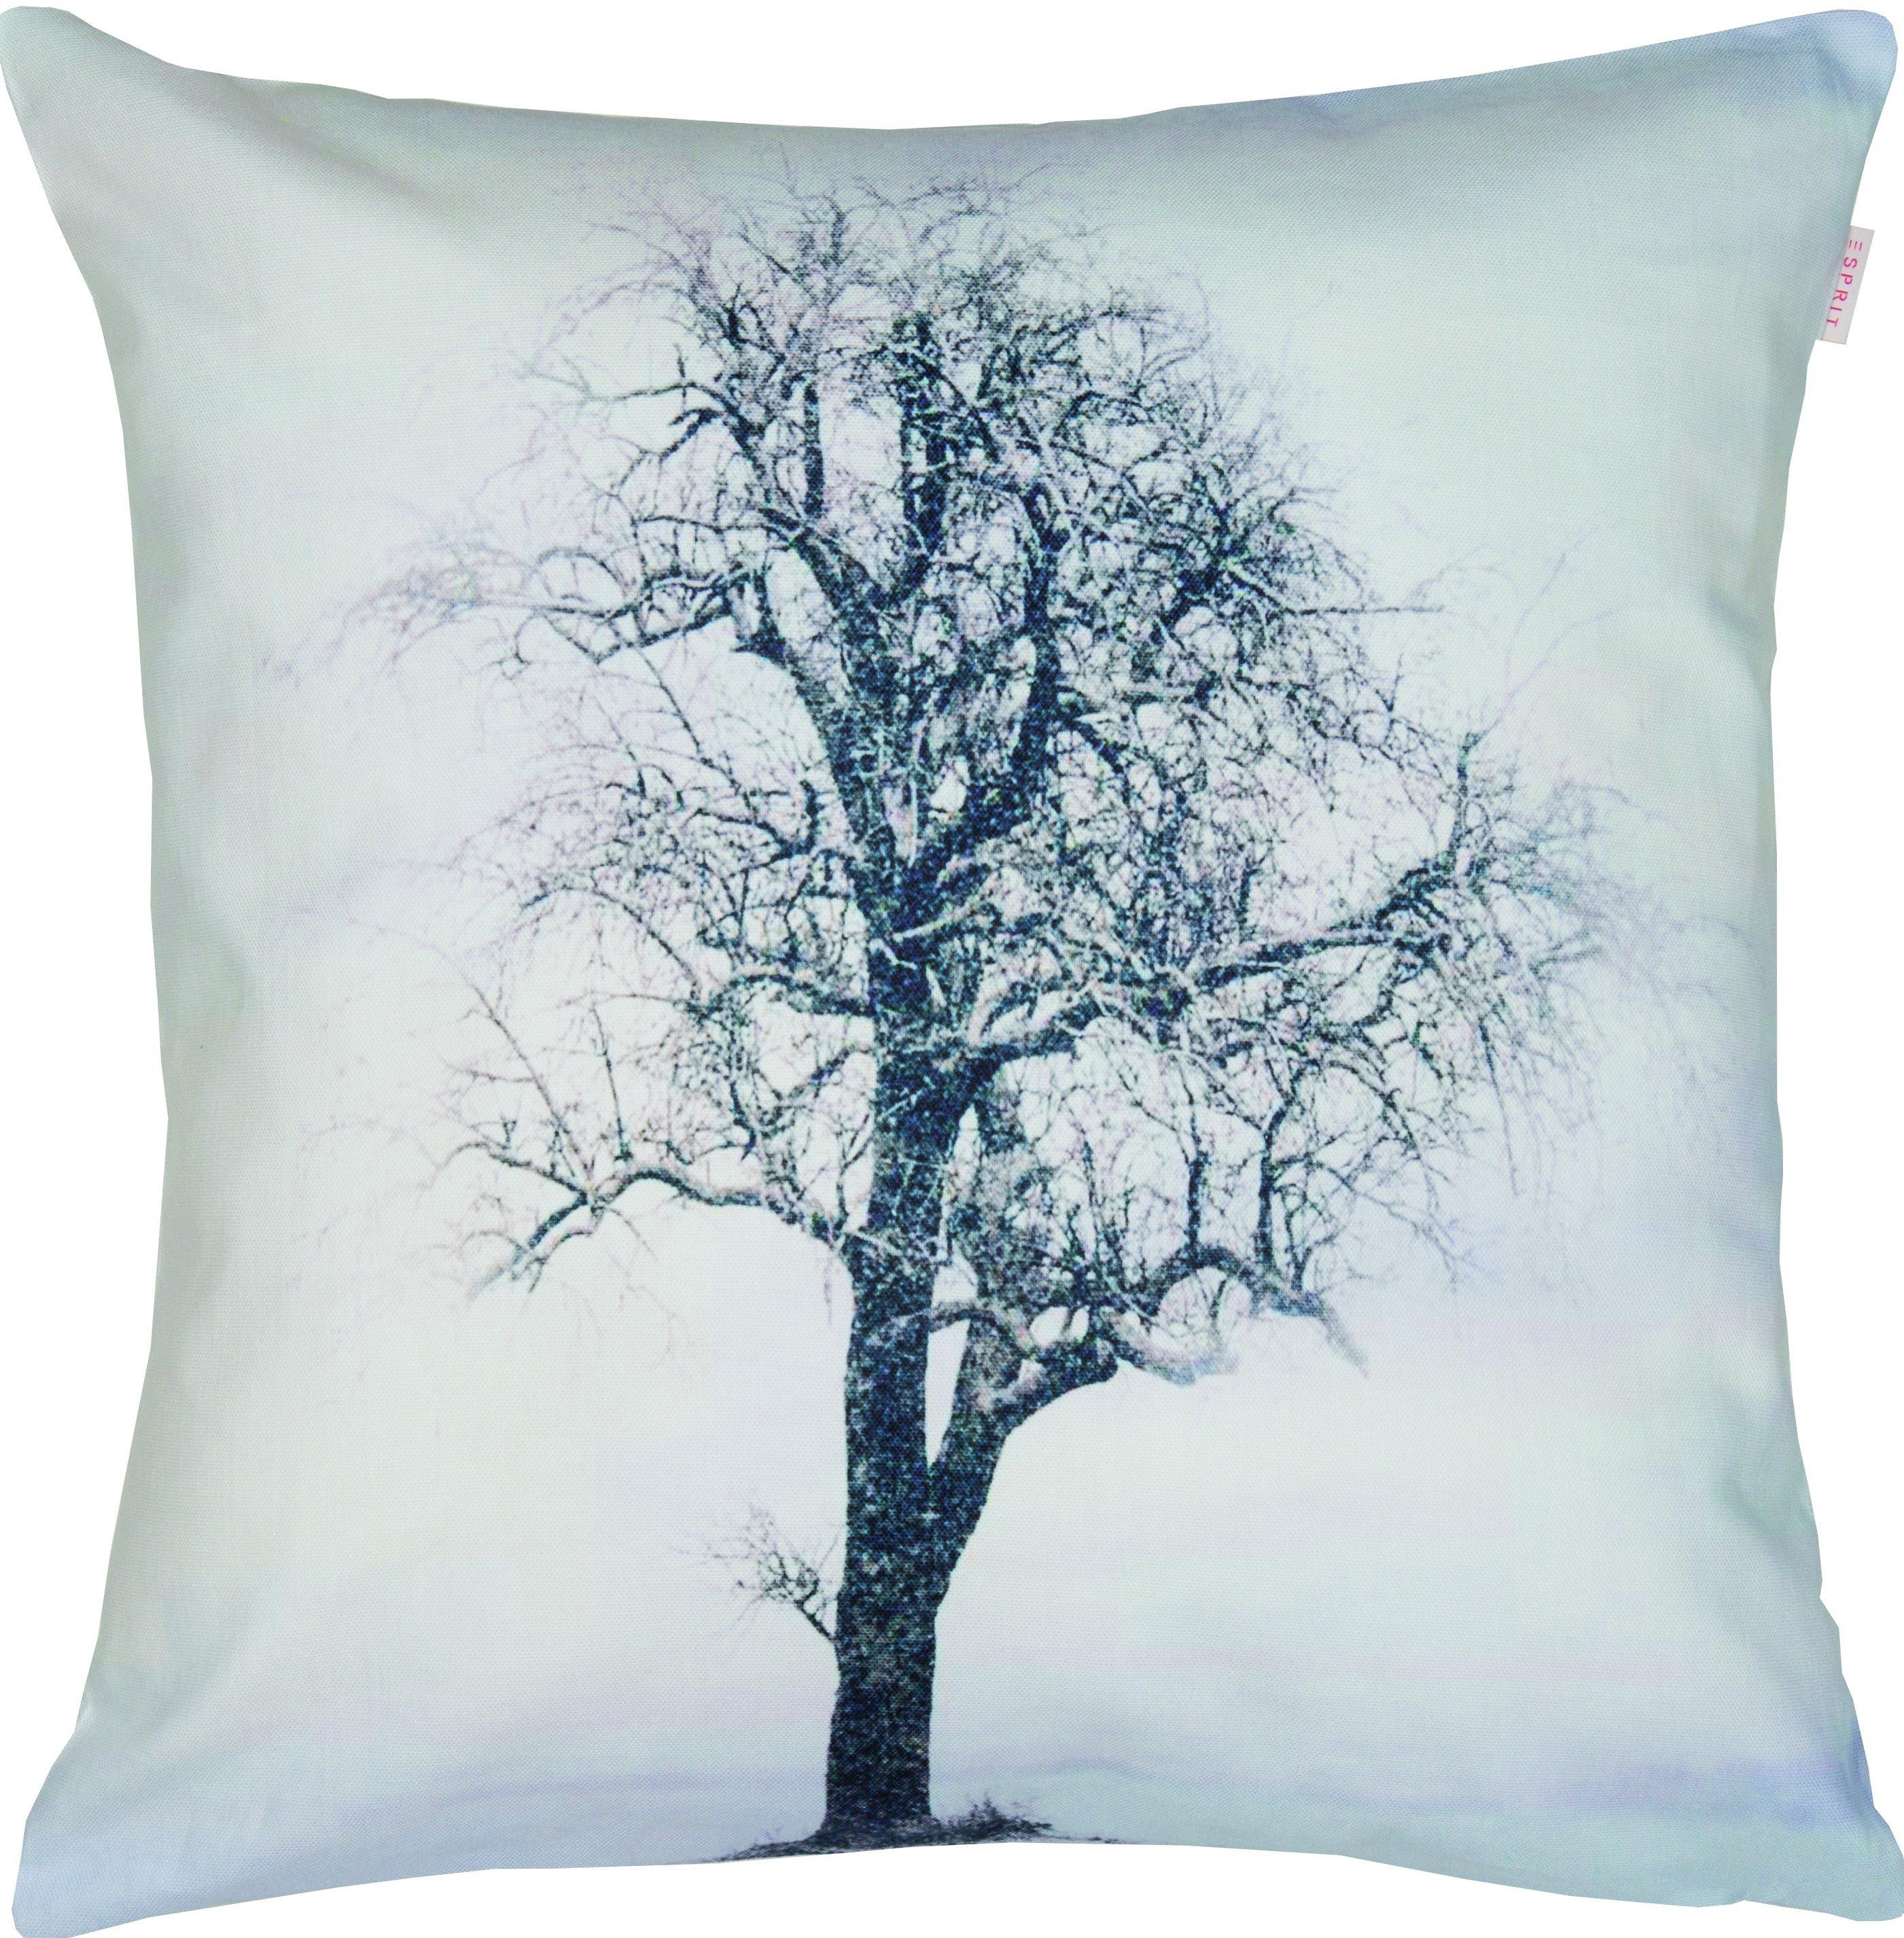 Kissenhülle, Esprit, »Wintertree« (1 Stück)